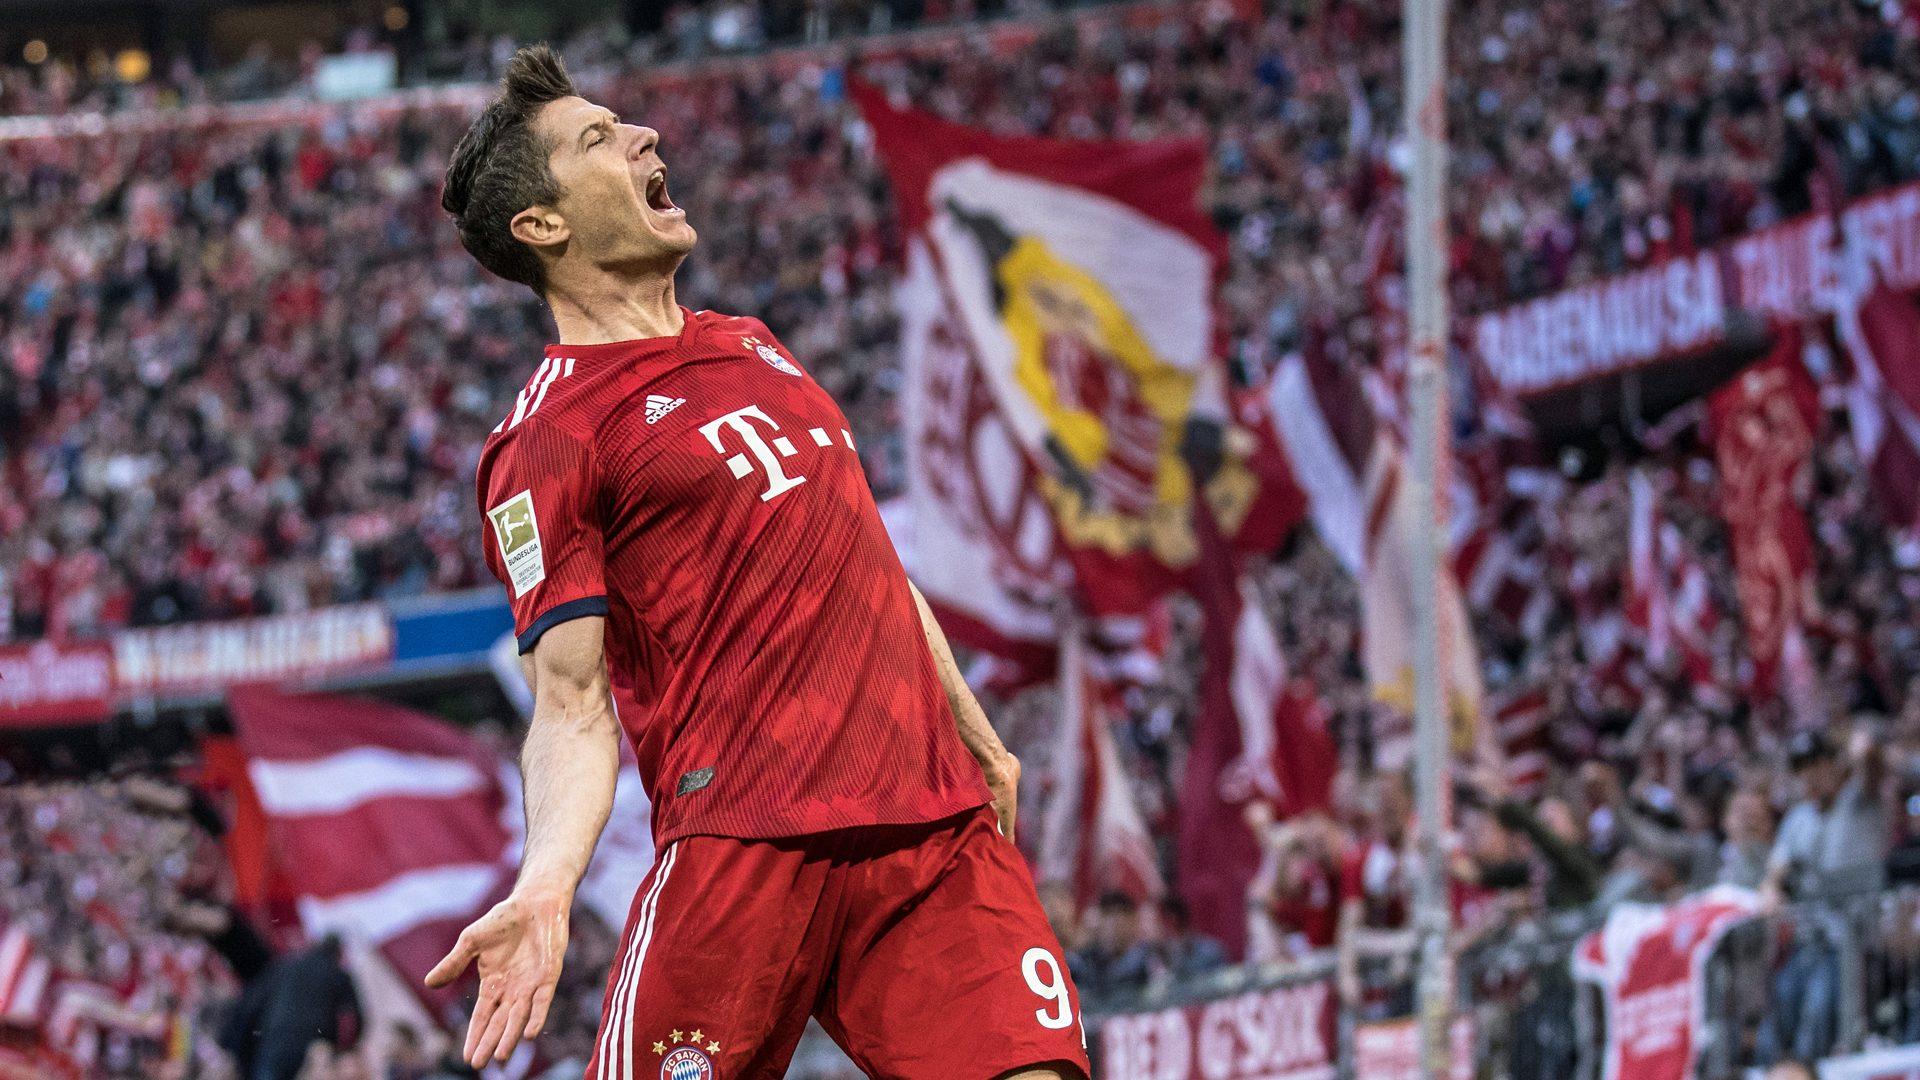 Robert Lewandowski attaccante del Bayern Monaco